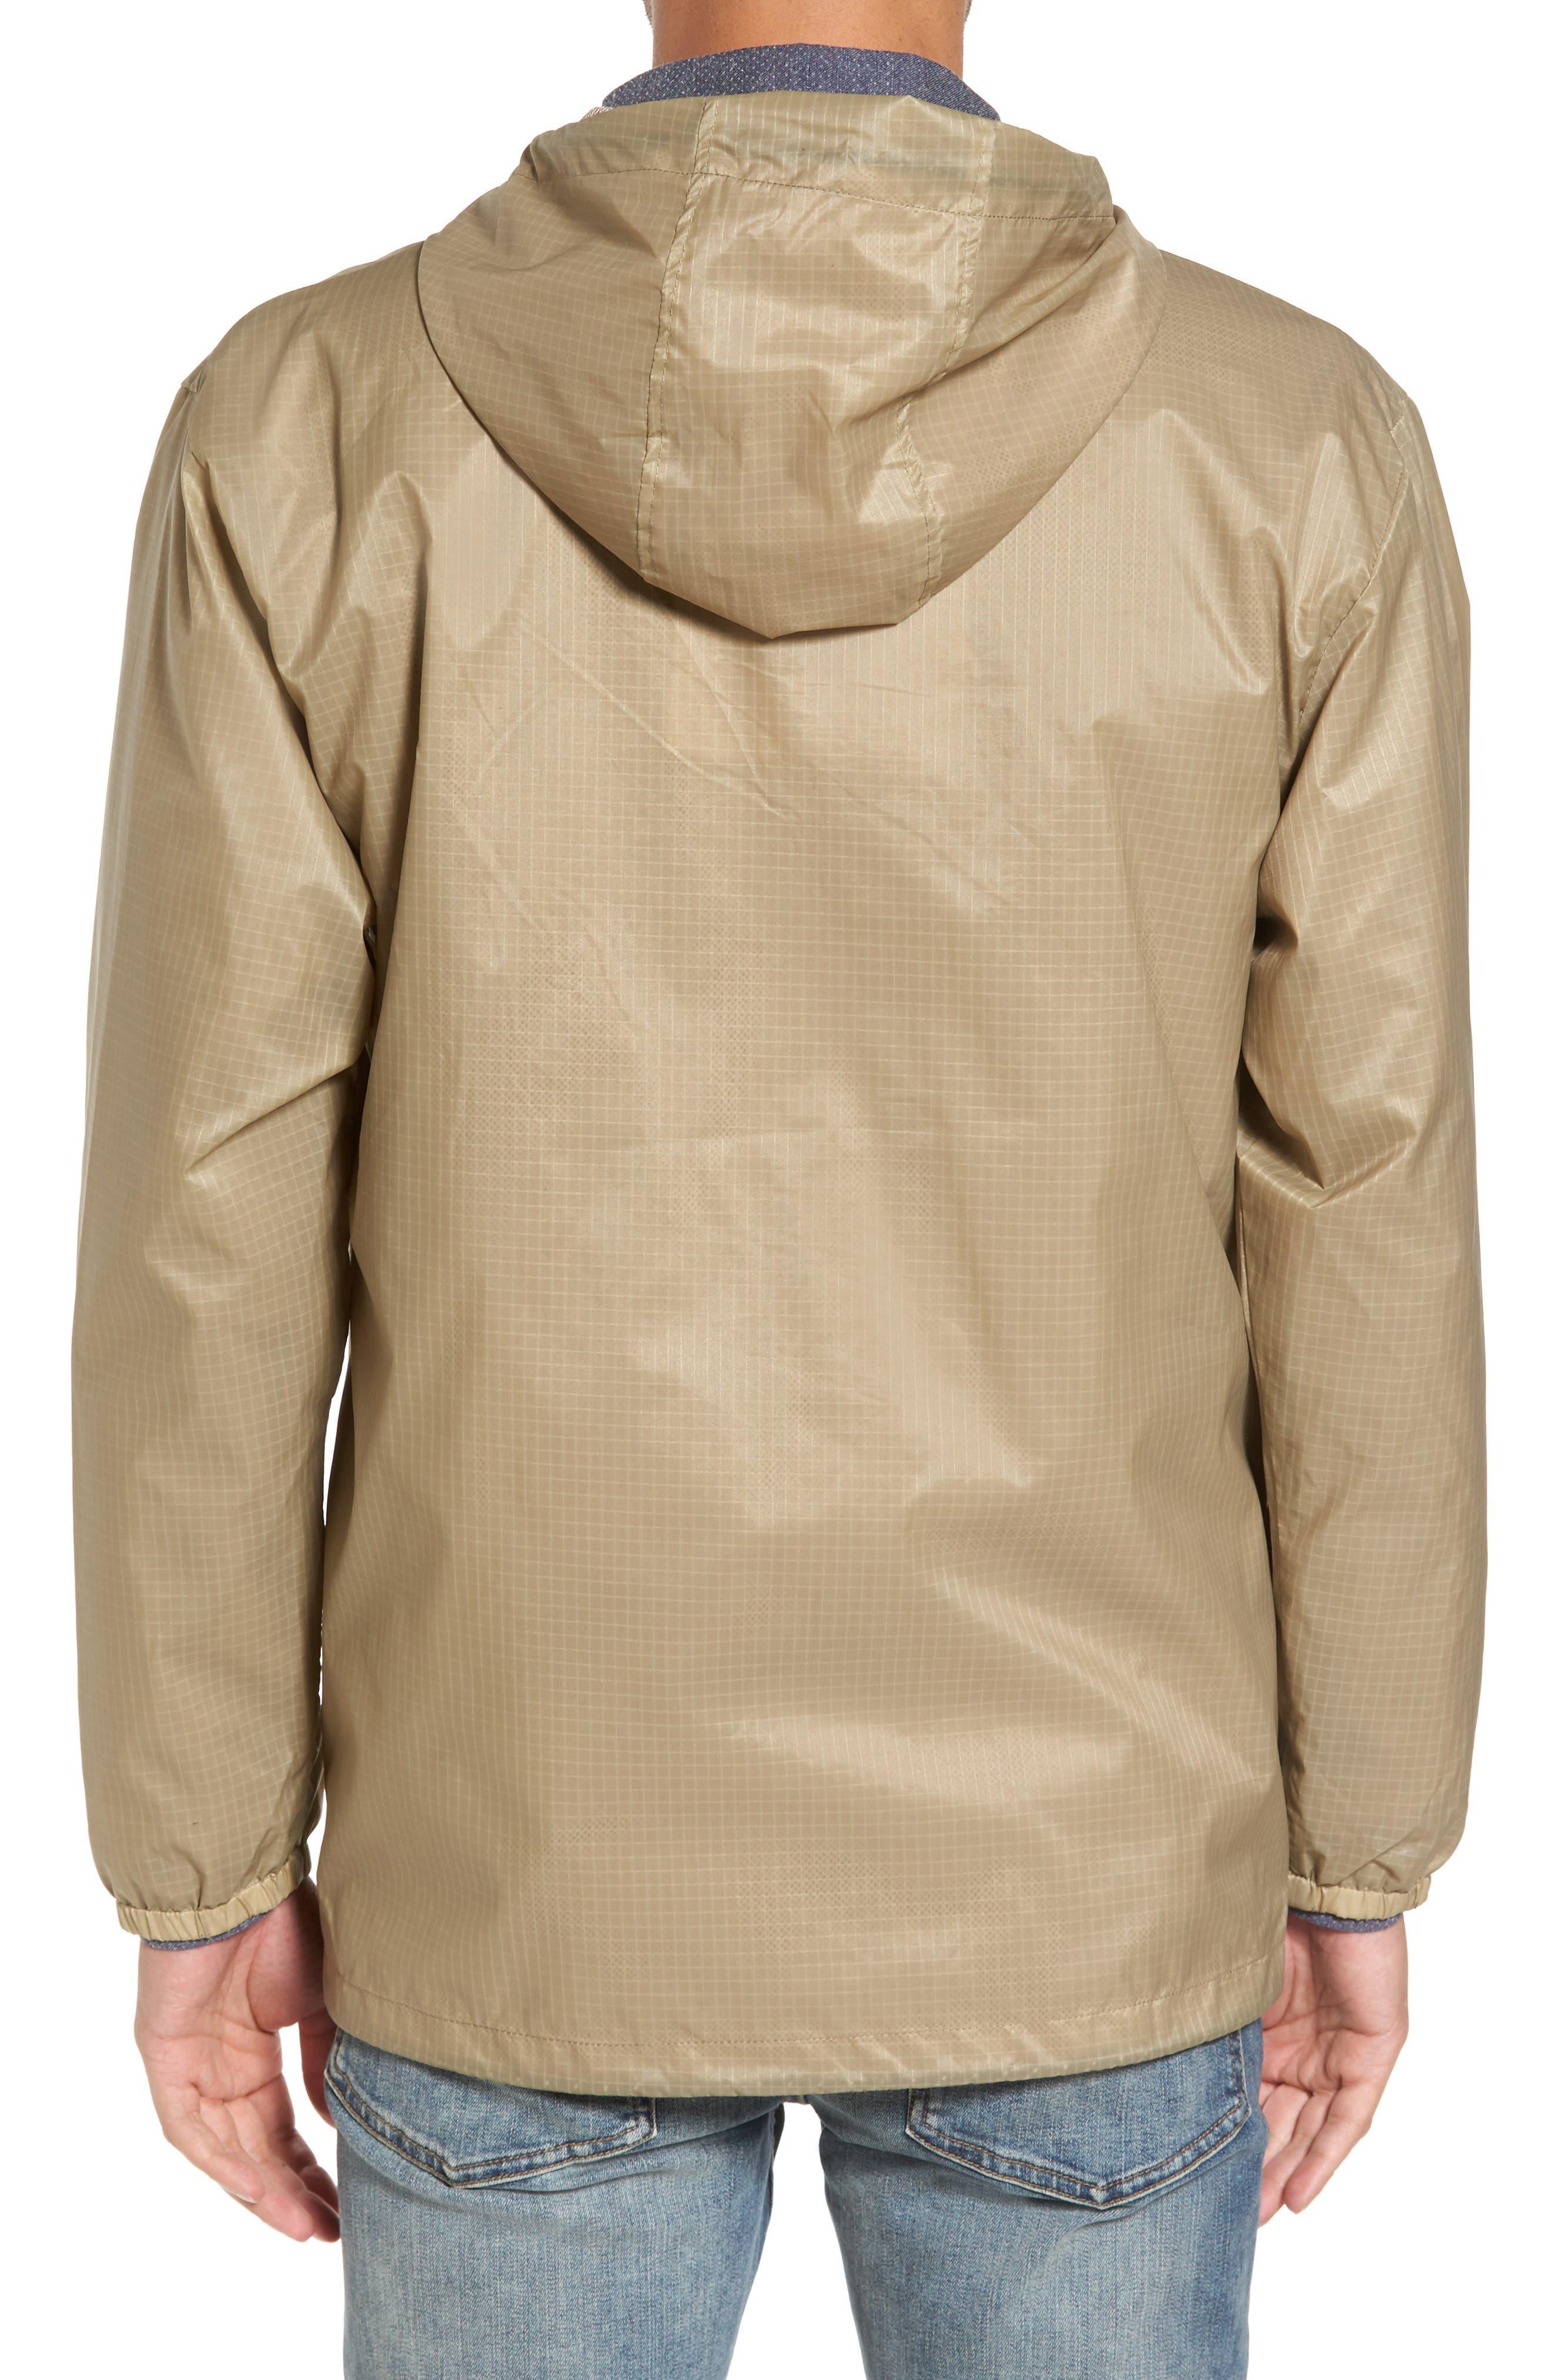 NCT Vulcan Coach's Jacket,                             Alternate thumbnail 4, color,